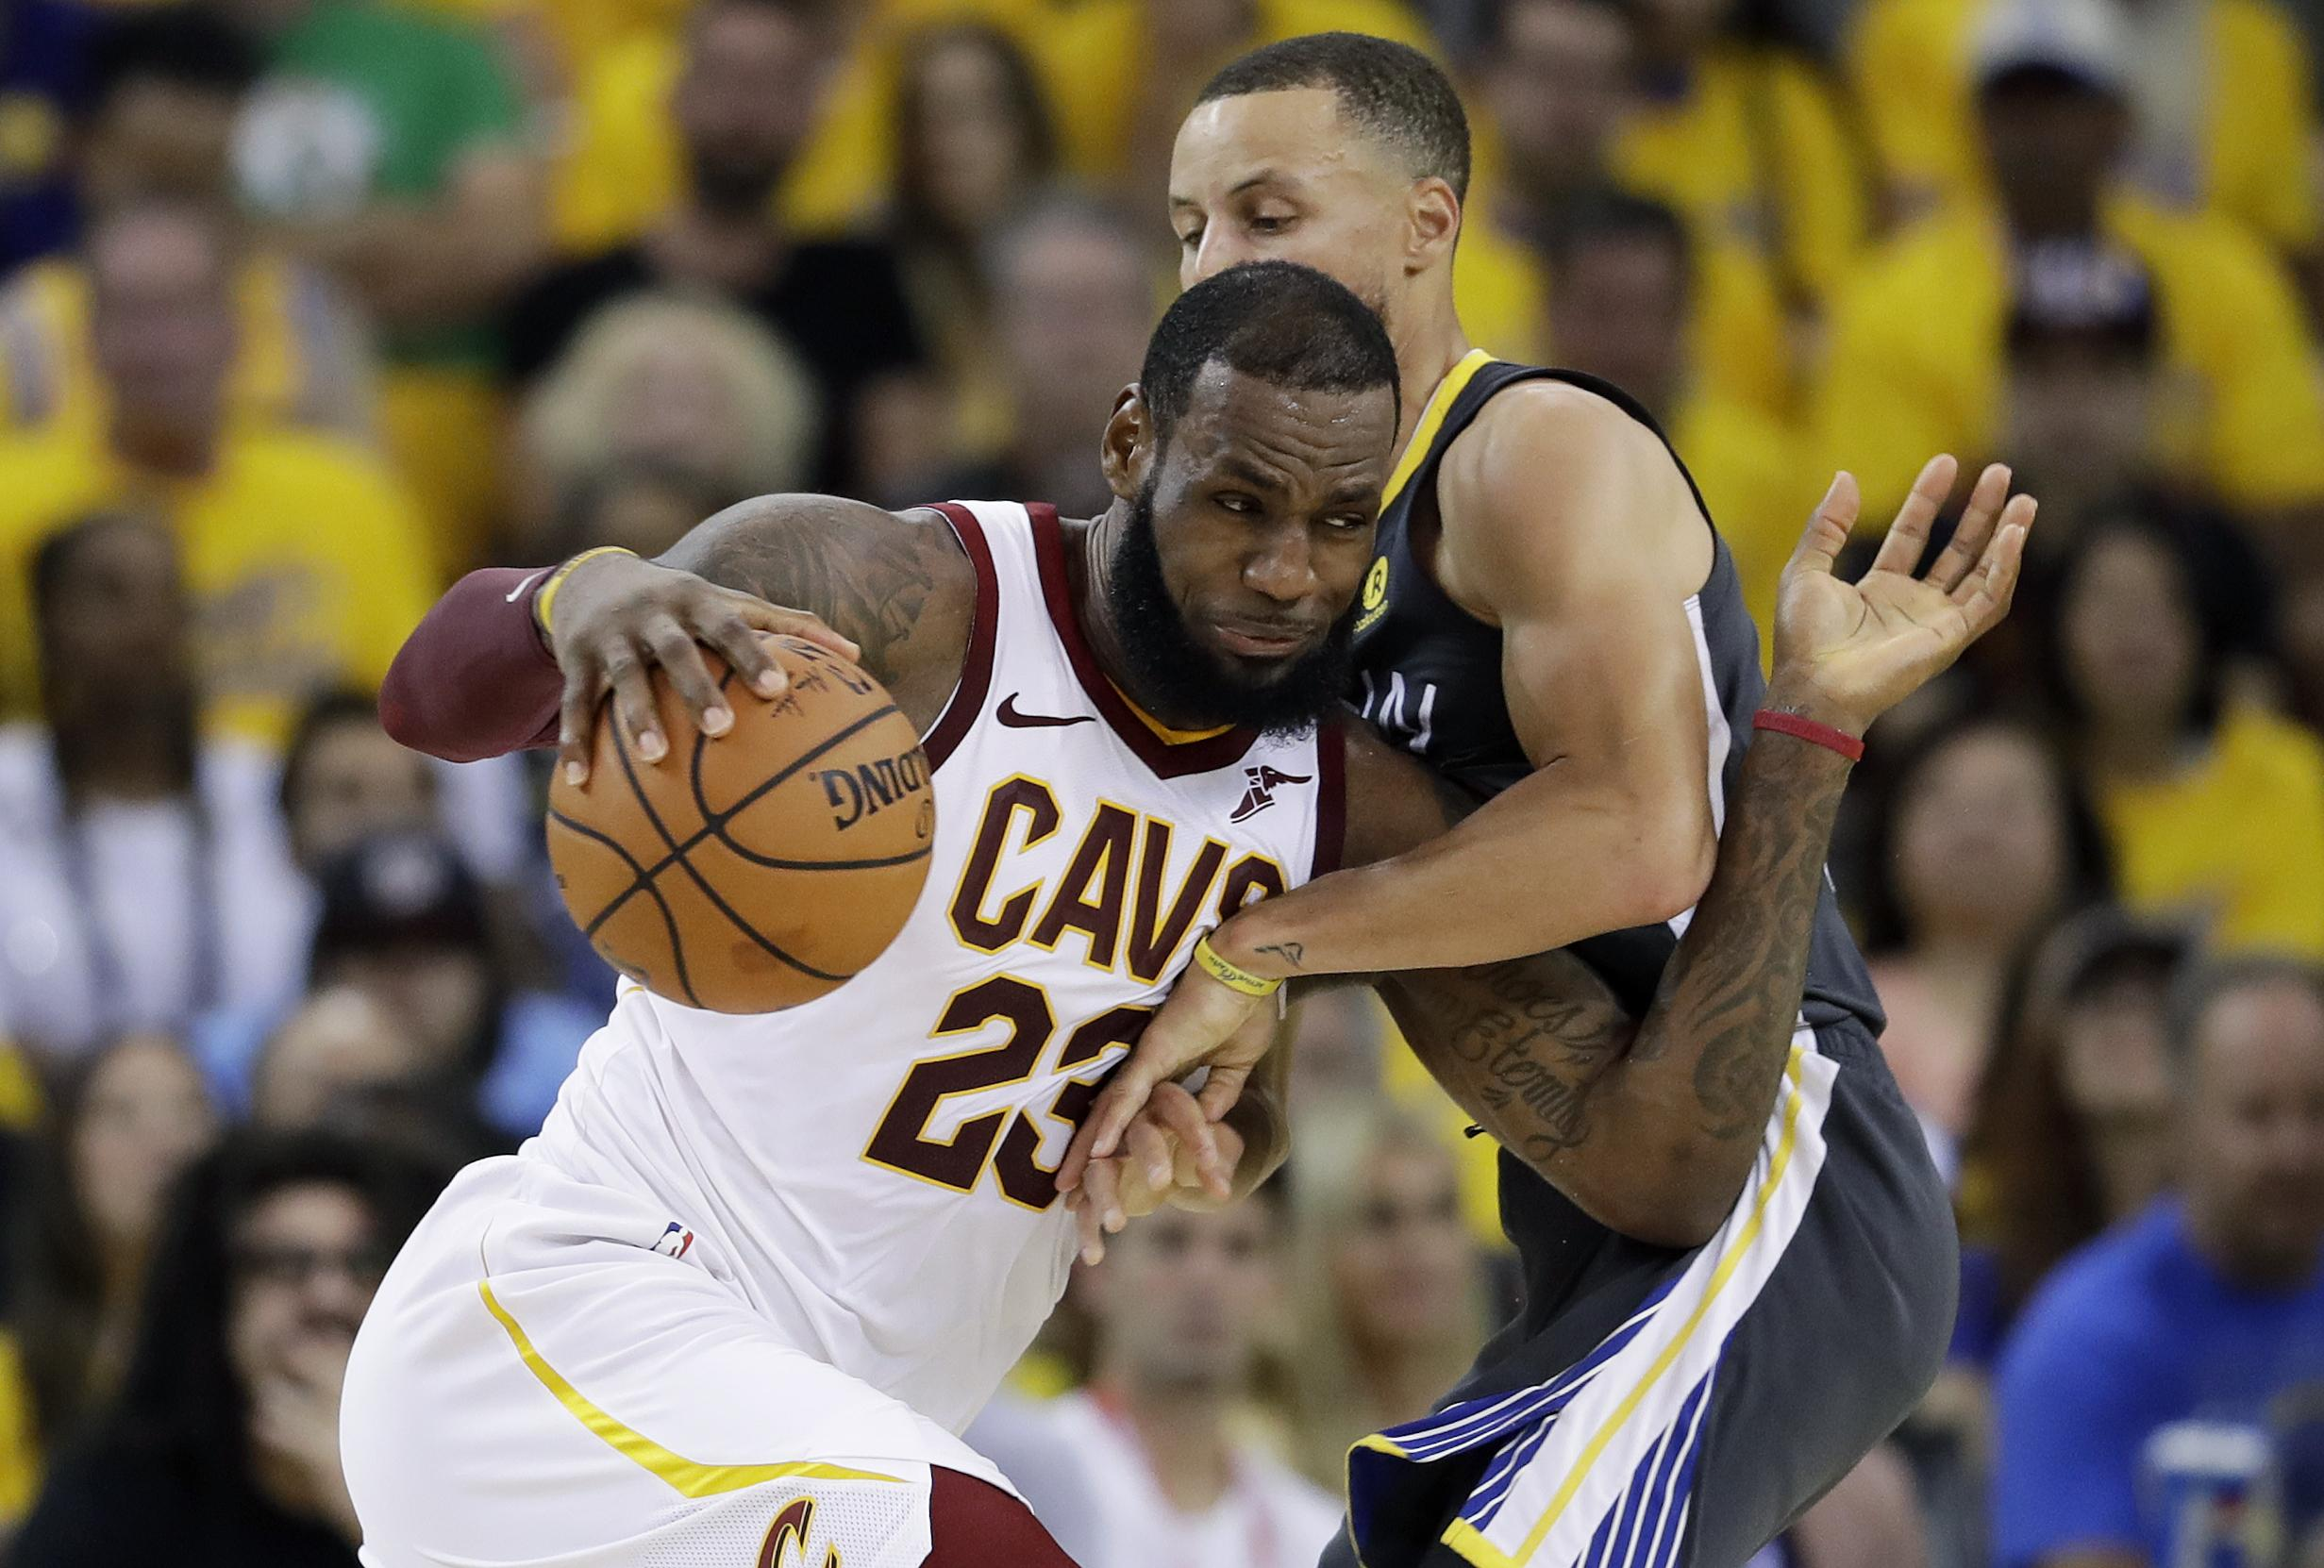 cc4d55edbdc Cavaliers turn LeBron James' old locker into towel closet rather than  reassigning it - Washington Times